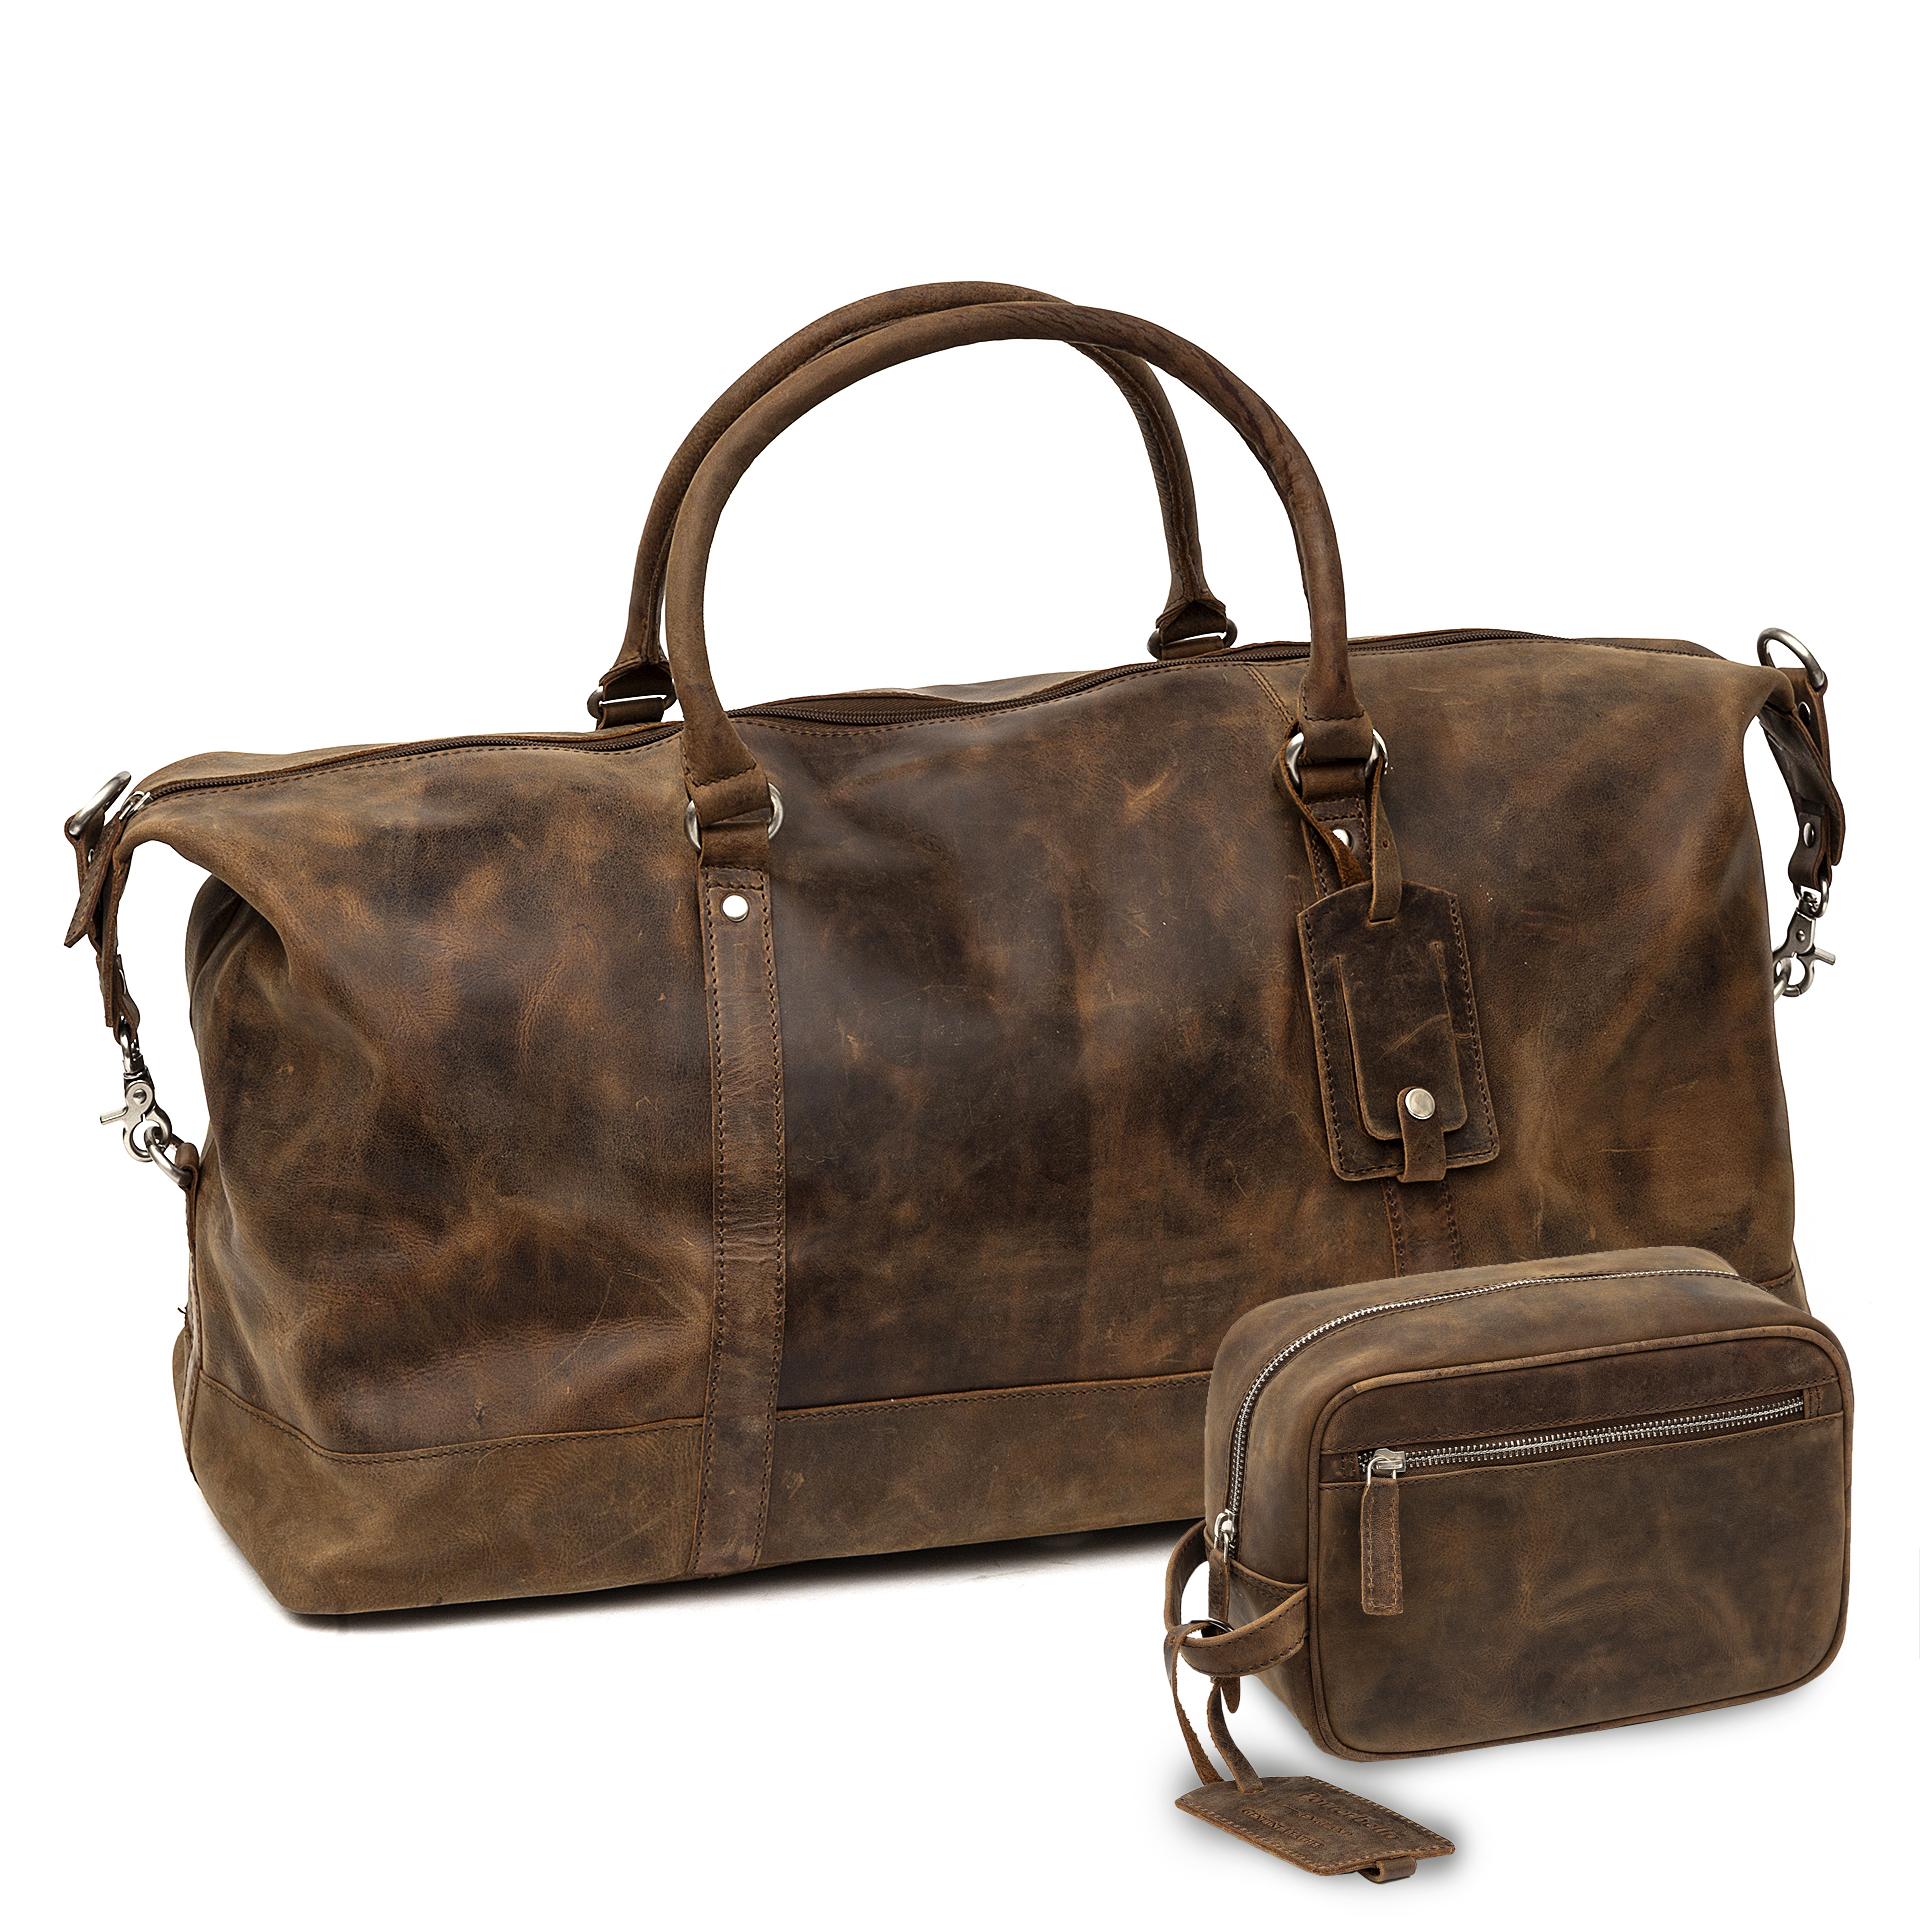 0ce2b8eb2b distressed leather duffle bag holdall brown cabin bag weekend flight bag